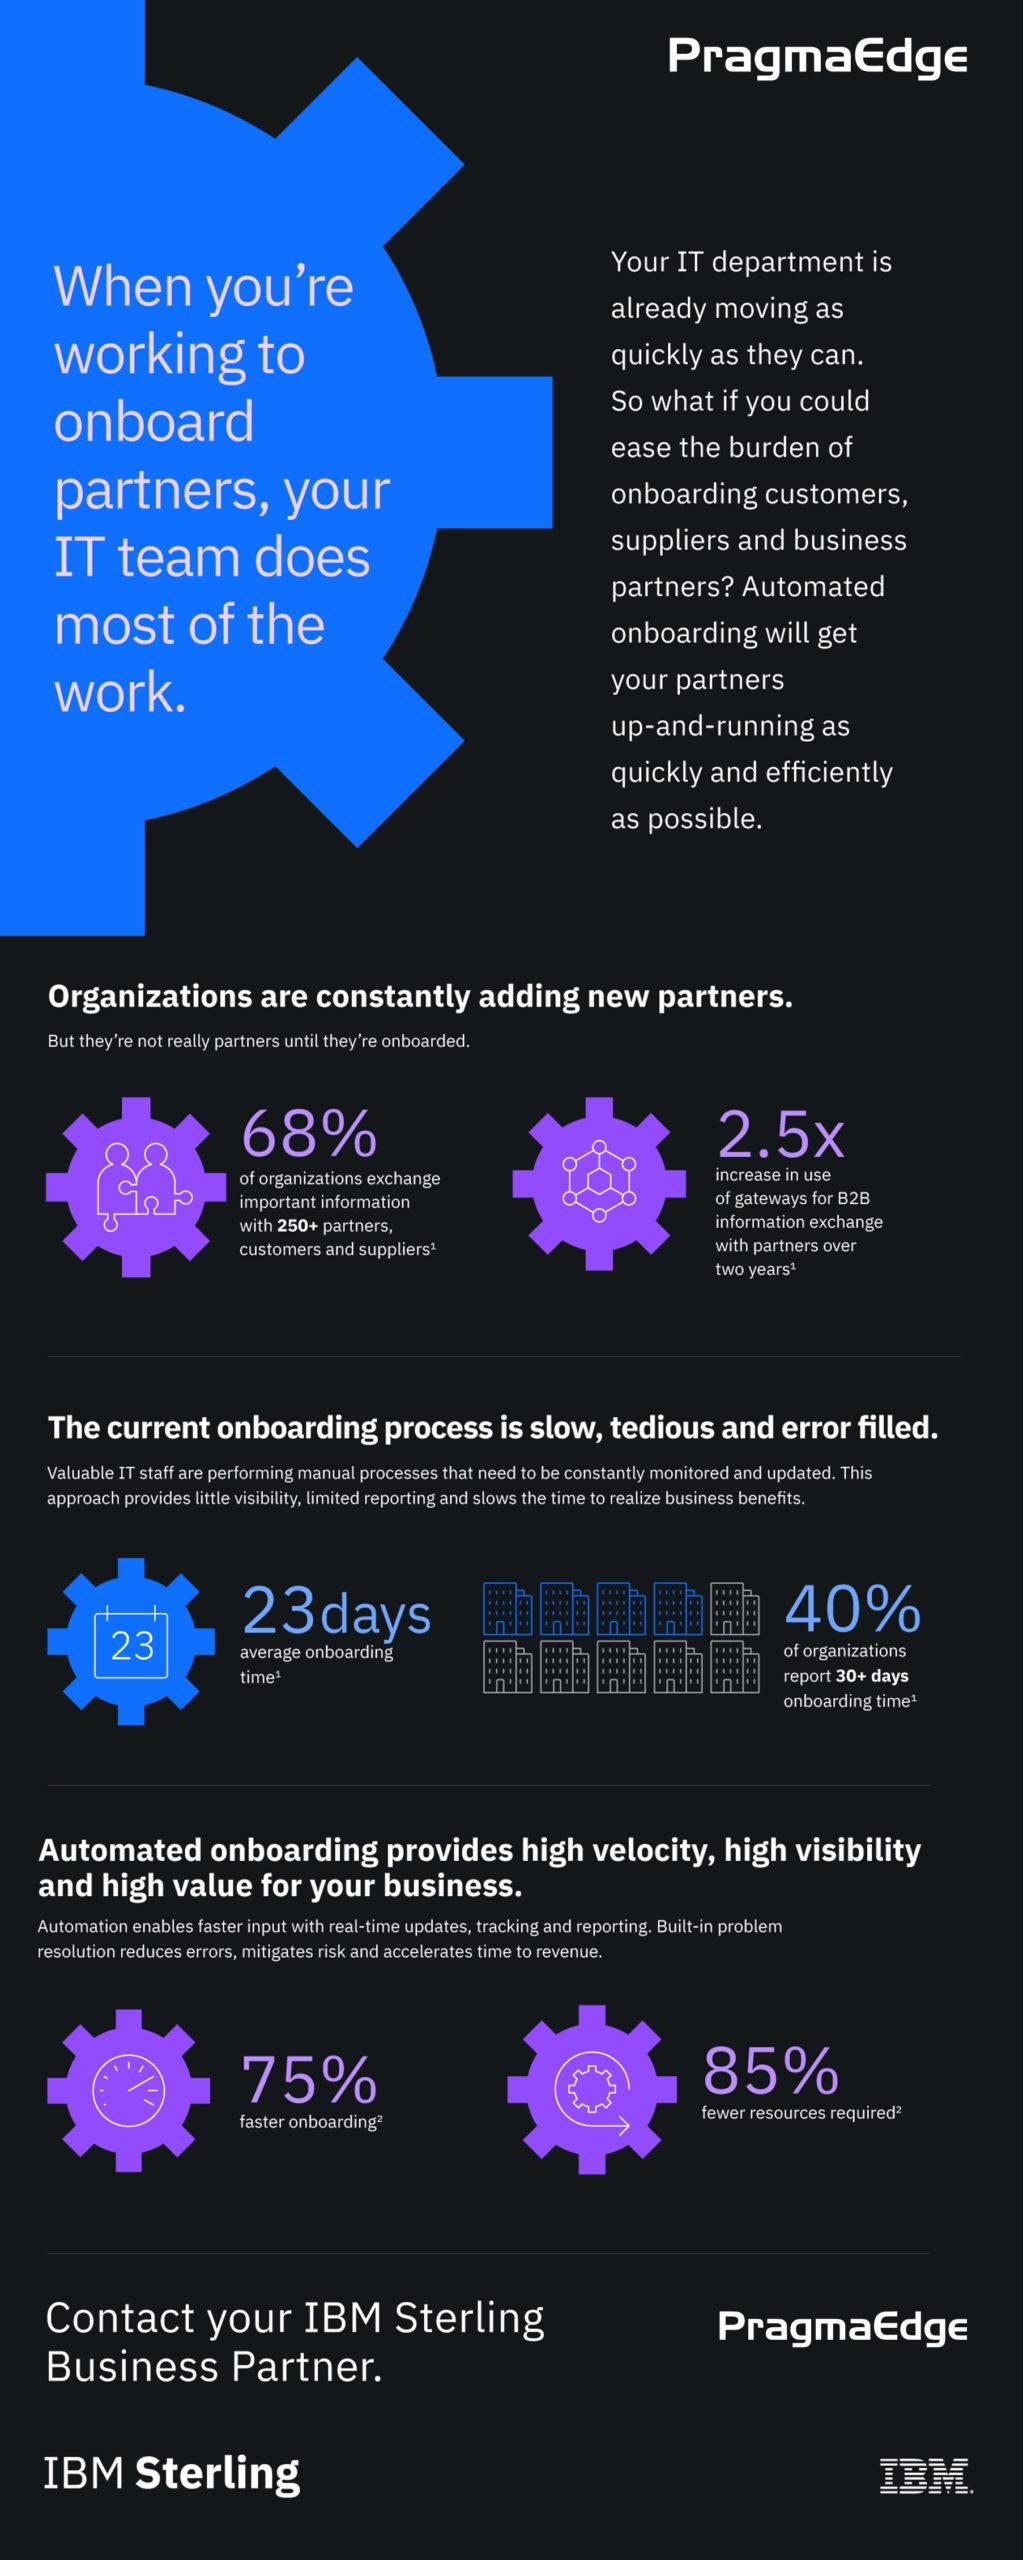 pem, partner engagement manager, cloud, IBM, Watson, IBM Watson, Supply chain,